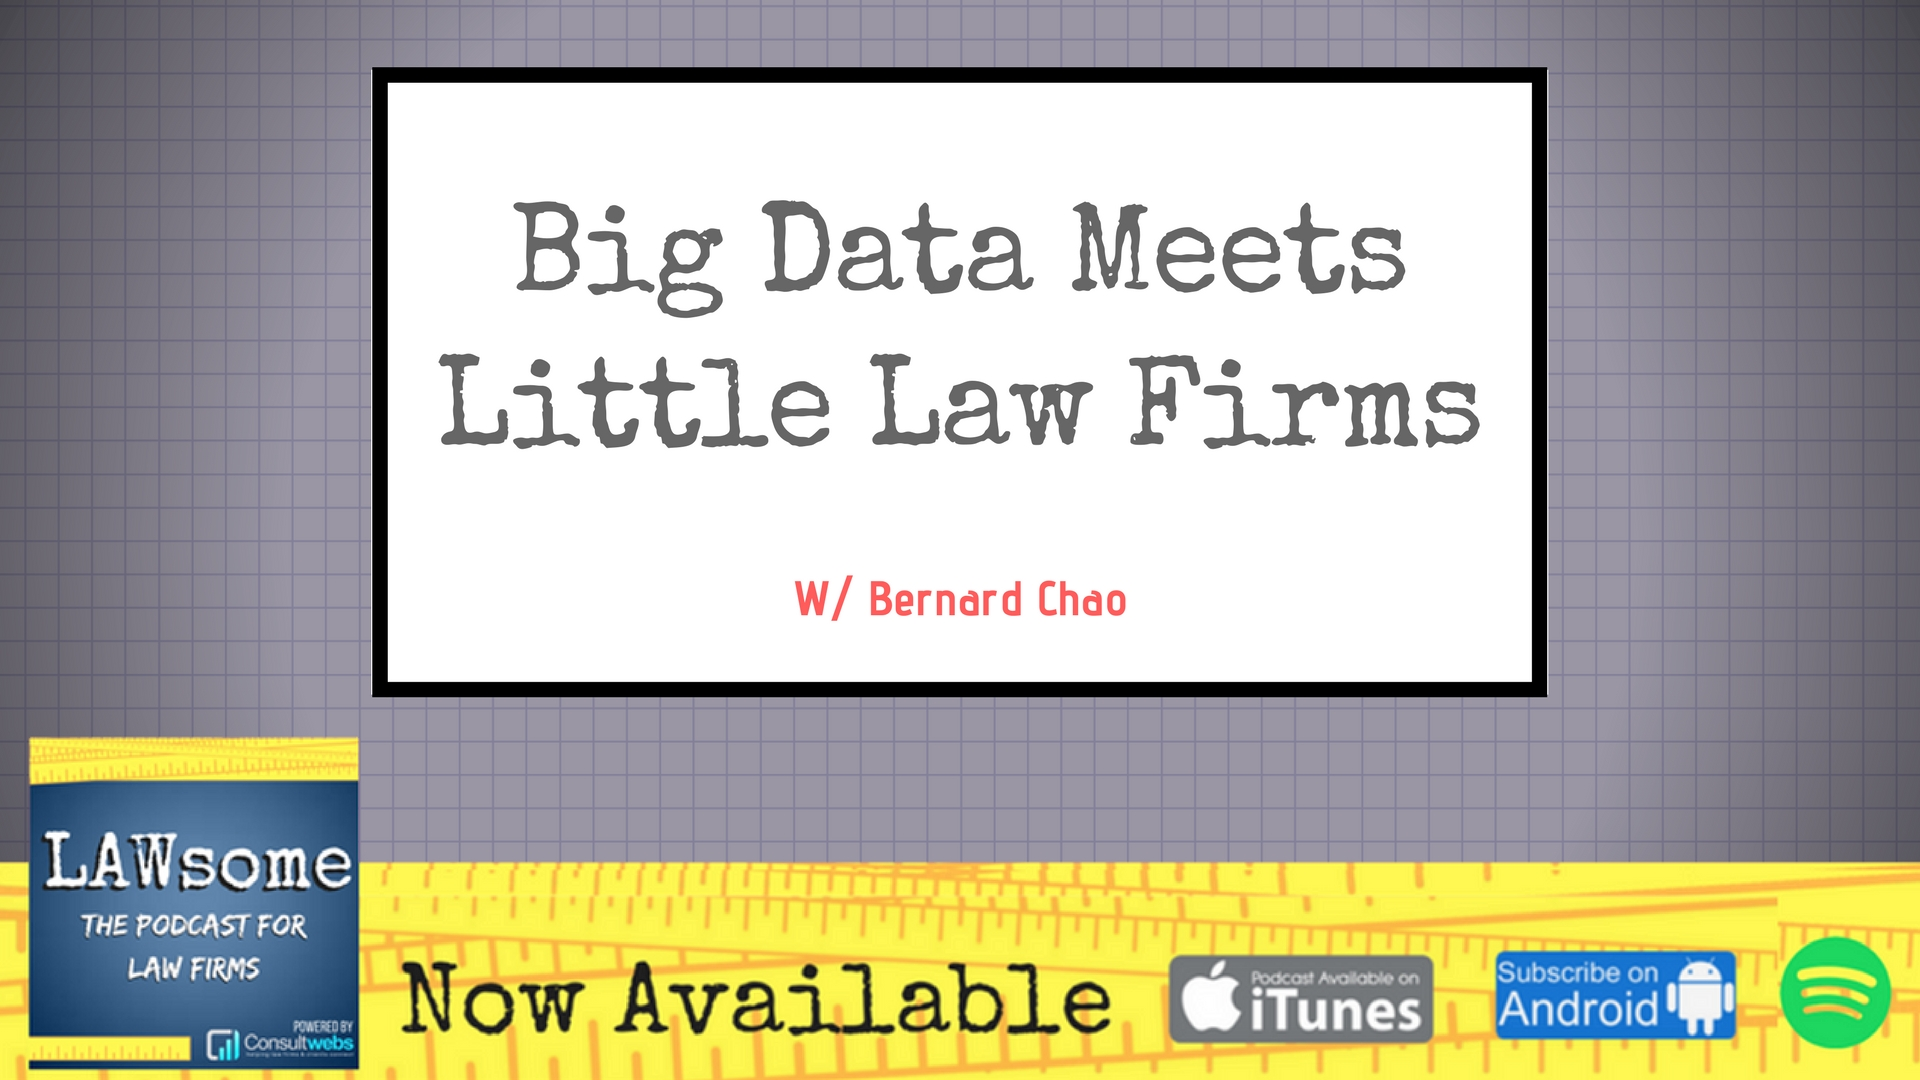 big data meets little law firms